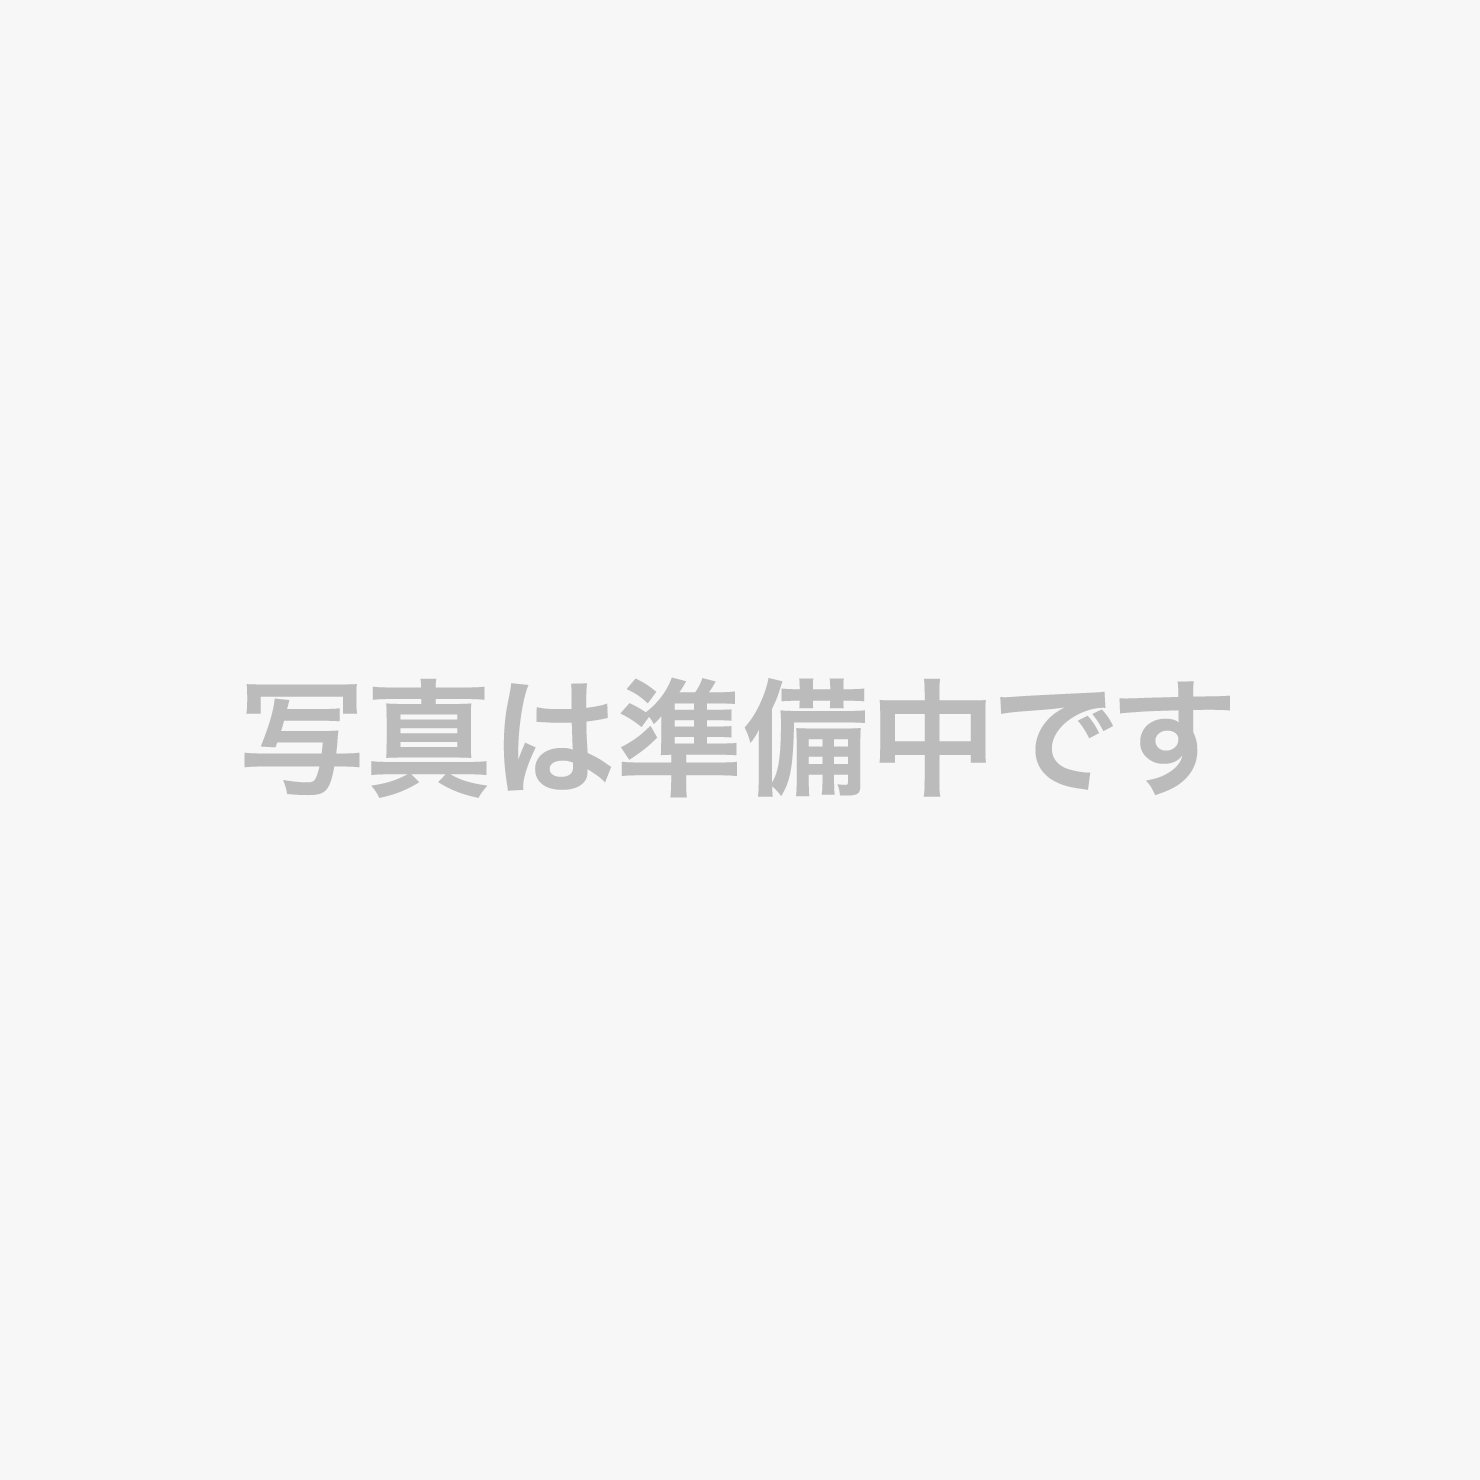 SENDAI光のページェント(写真提供:宮城県観光課)